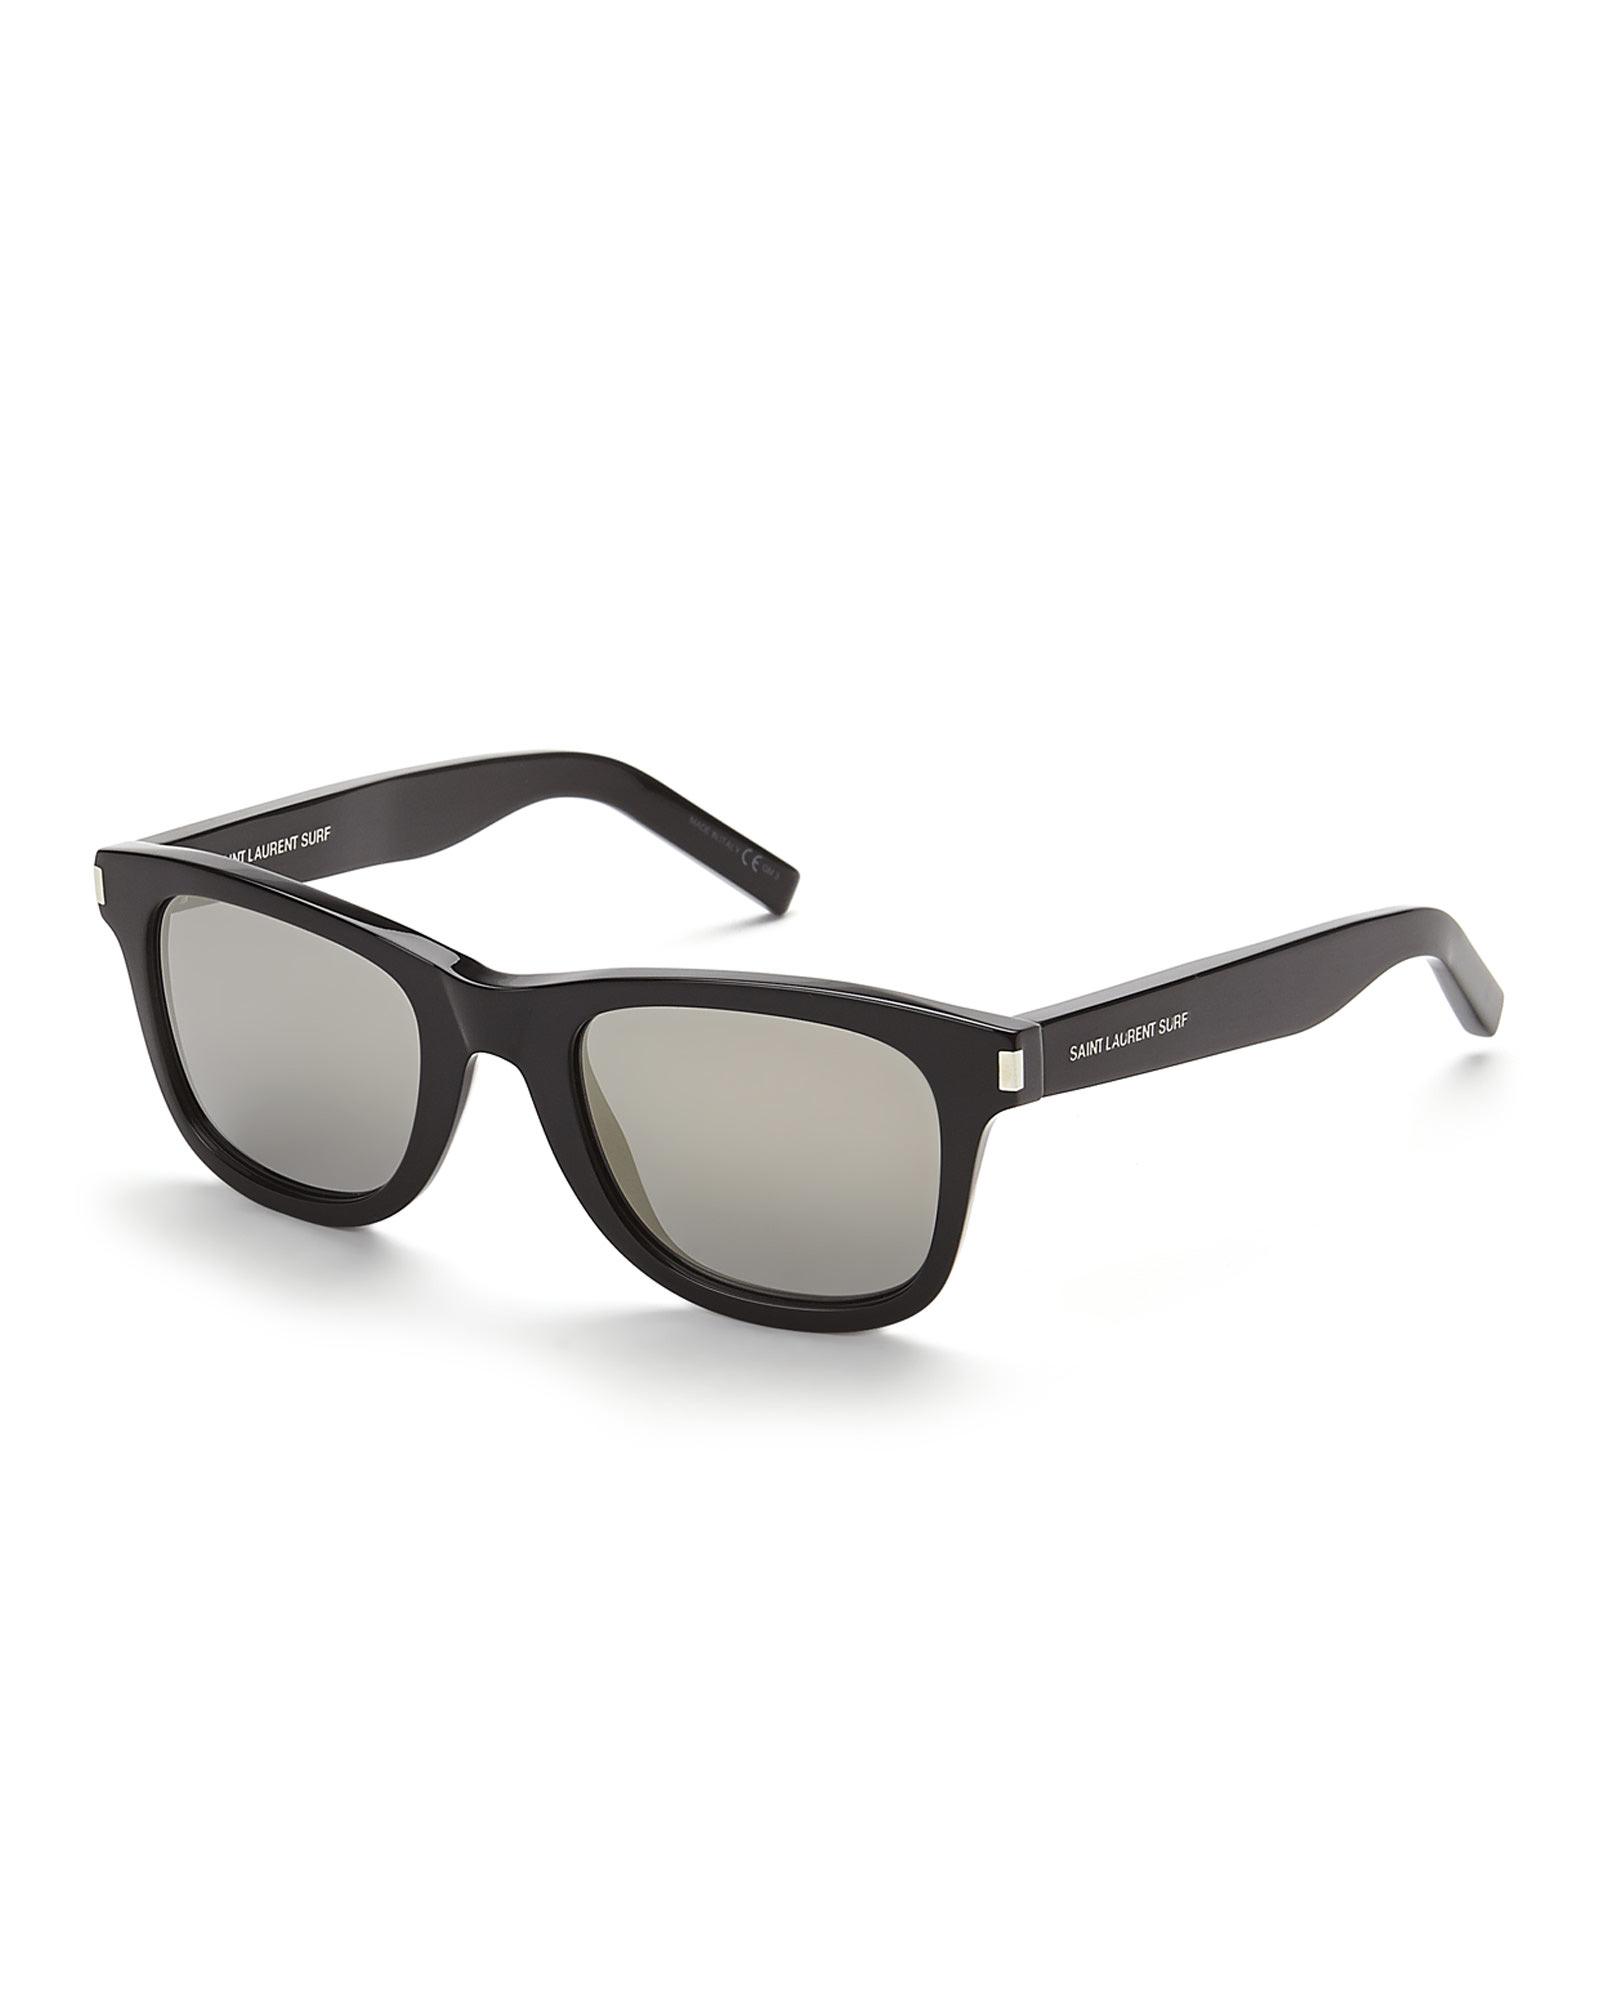 Saint Laurent Eyewear chunky frame wayfairer sunglasses Buy Cheap Finishline 8llFY